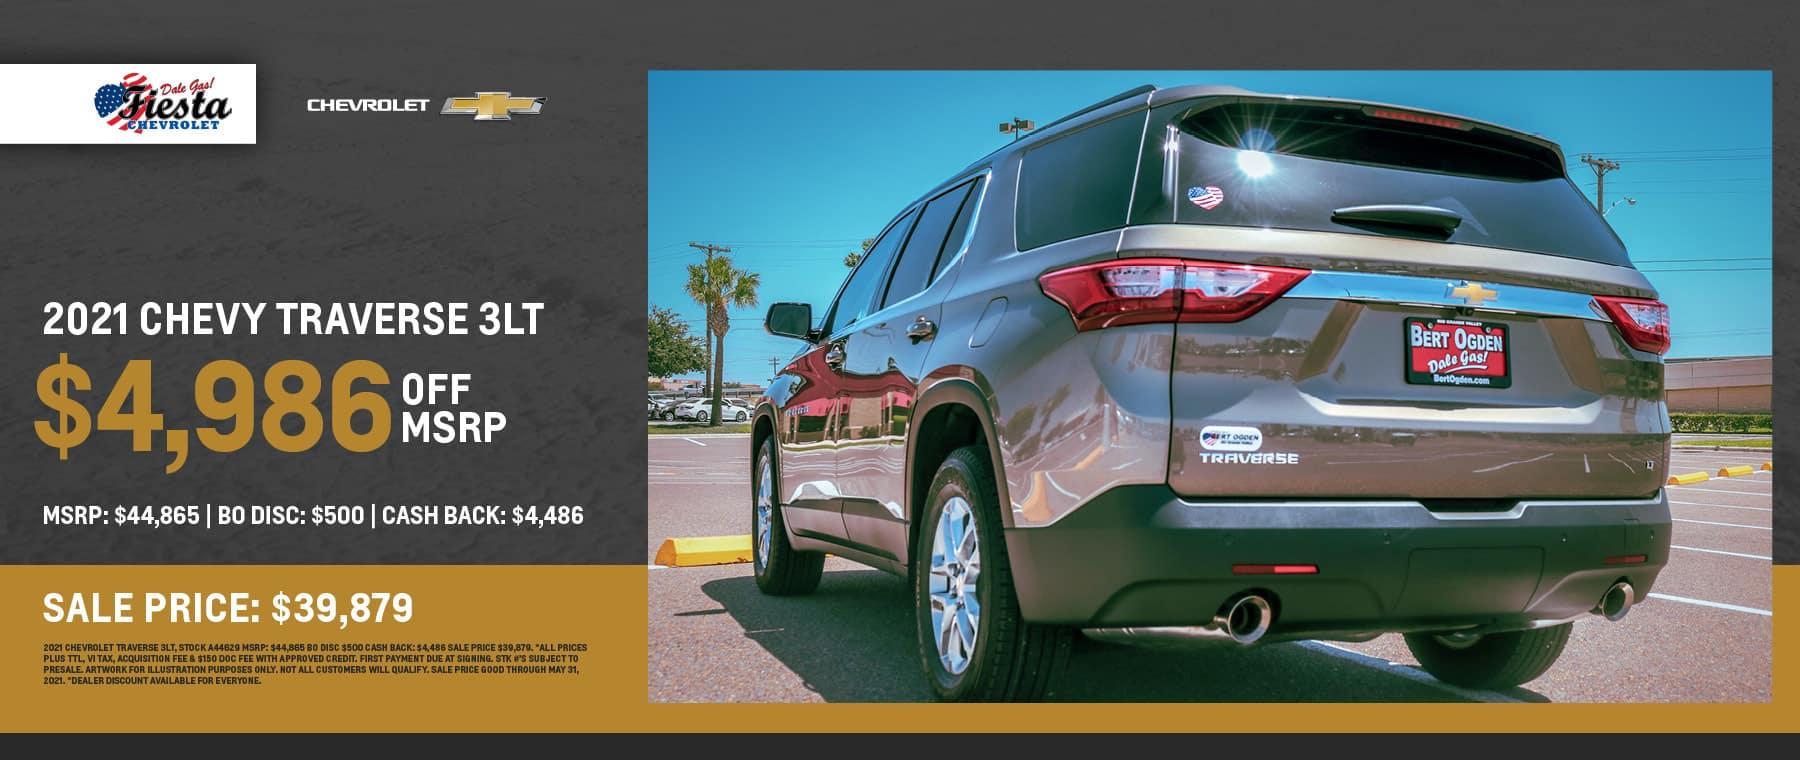 2021 Chevrolet Traverse 3LT - Fiesta Chevrolet in Edinburg, Texas